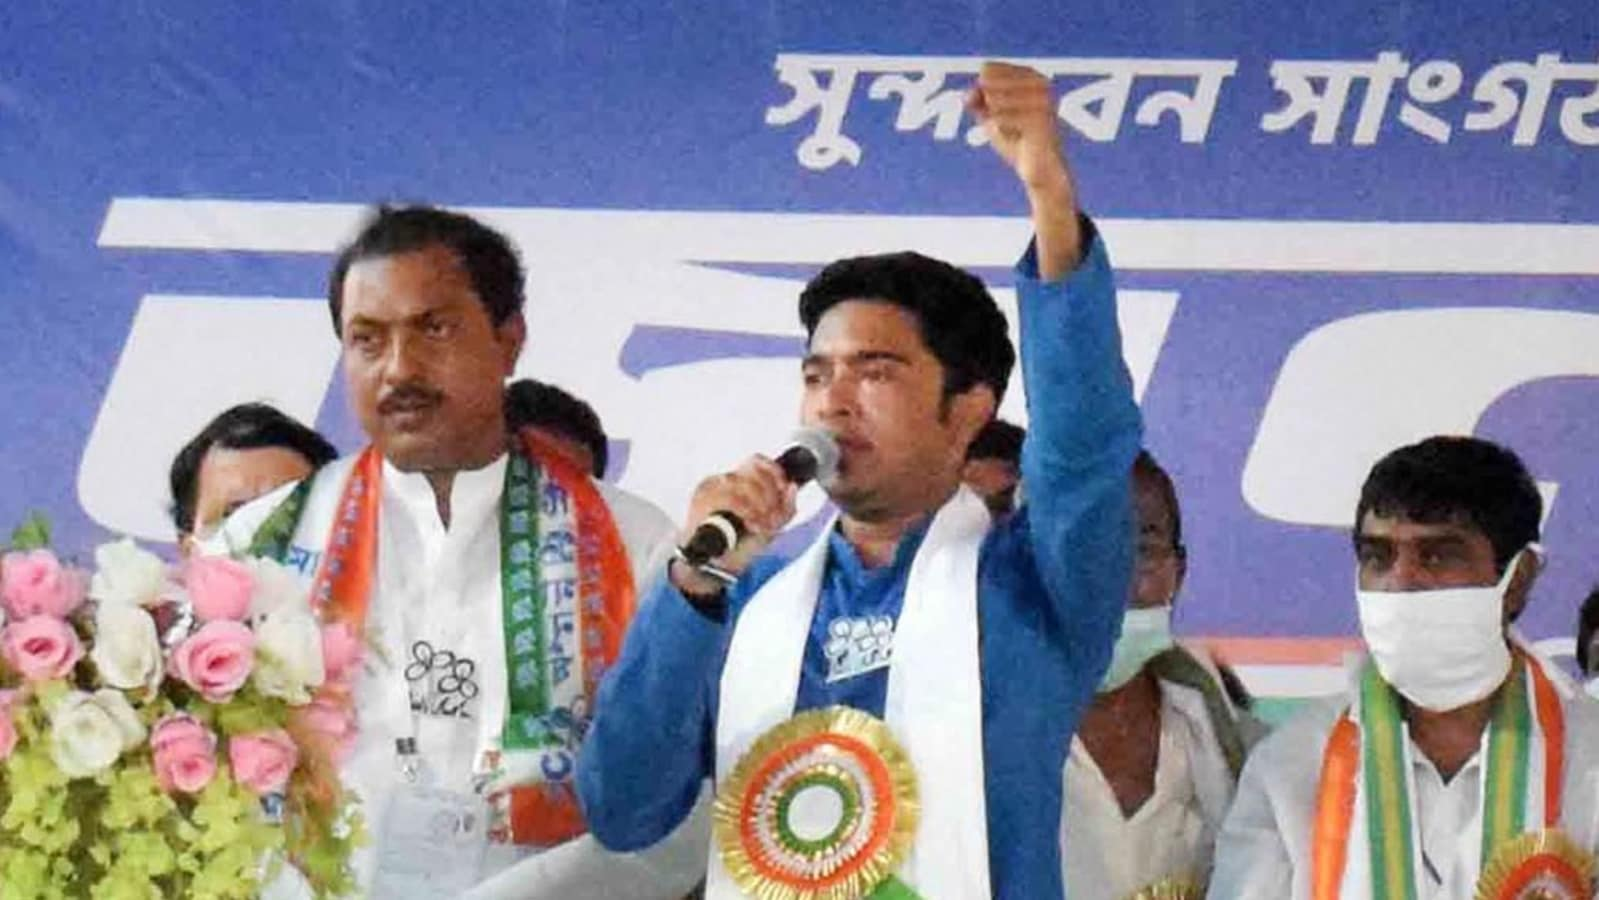 '4-0': Abhishek predicts scoreline ahead of Bengal bypolls; slams BJP for 'dishonouring' people's verdict